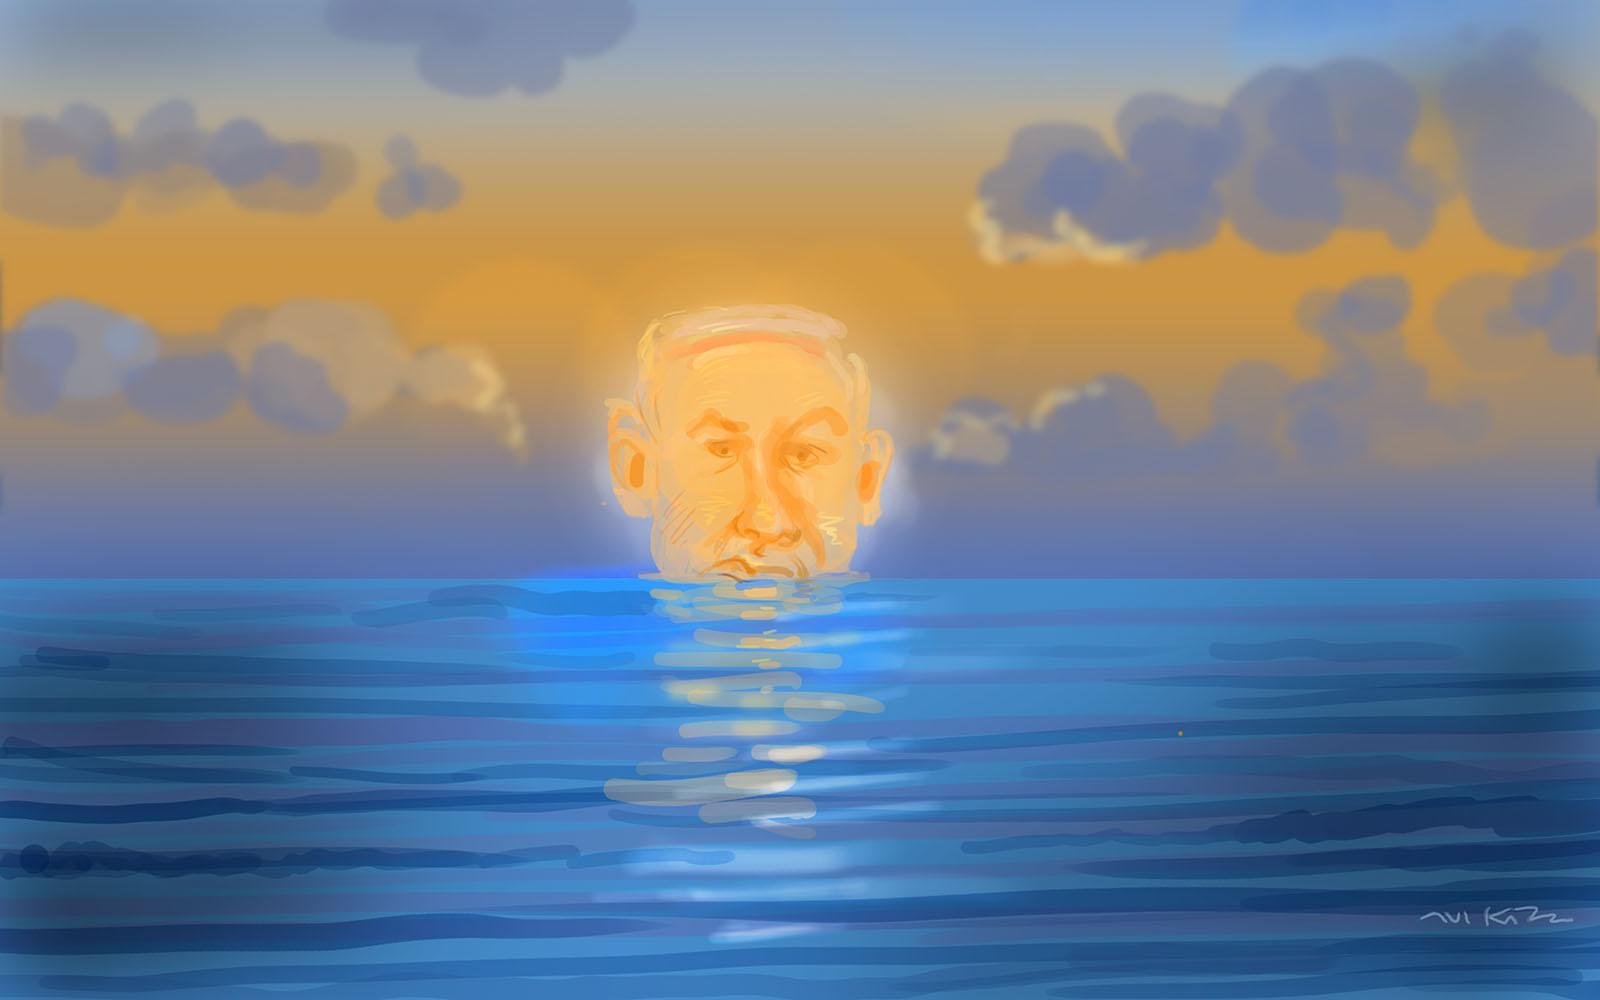 Netanyahu, the end